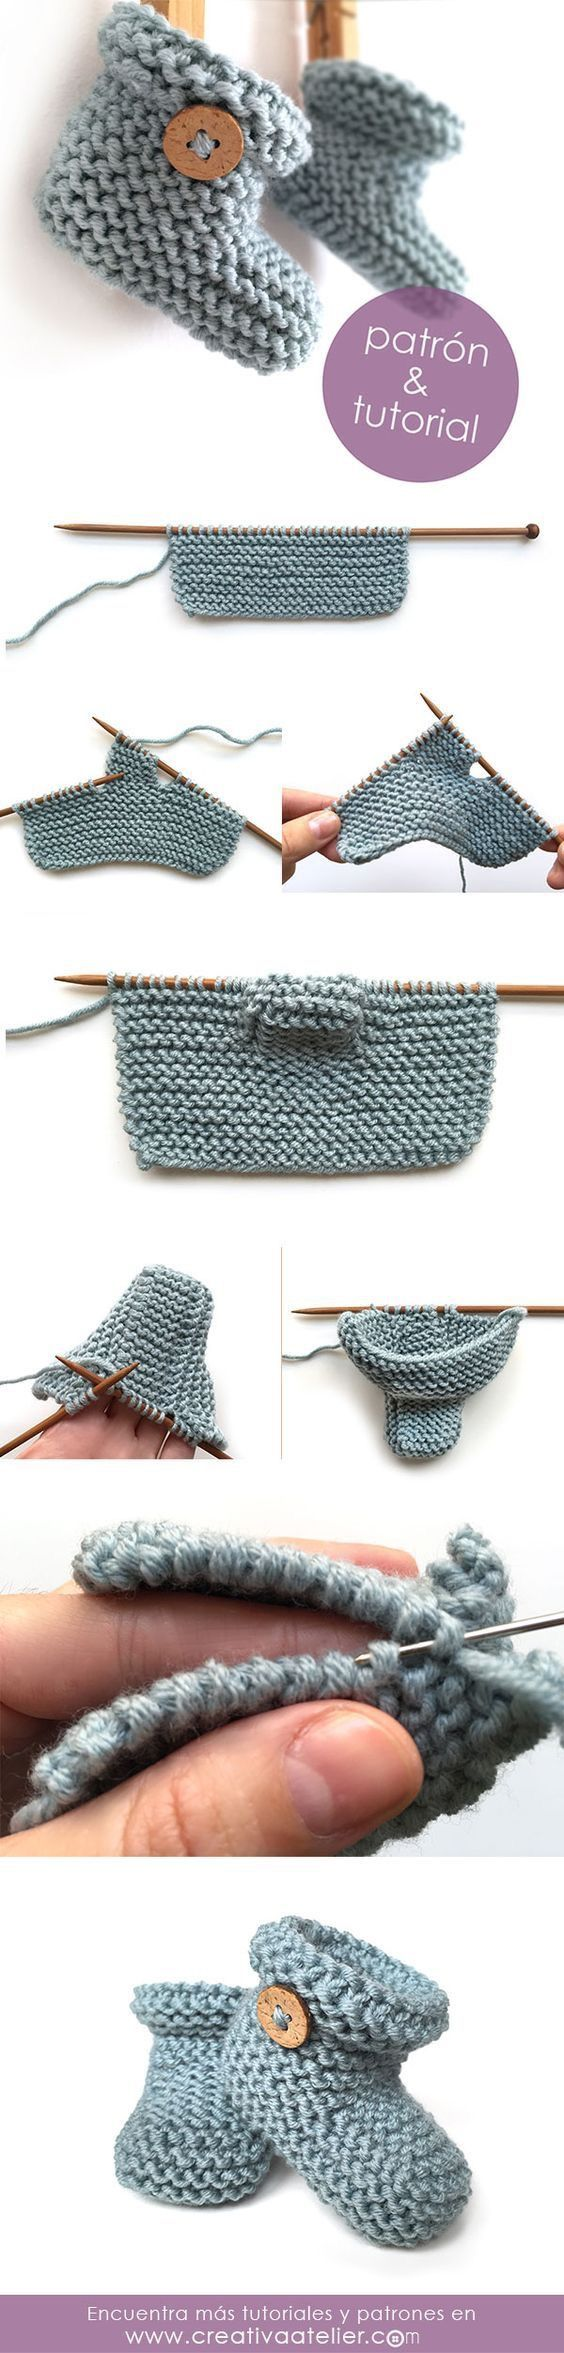 10 best bebe battayenesi images on Pinterest   Knit crochet, Knits ...